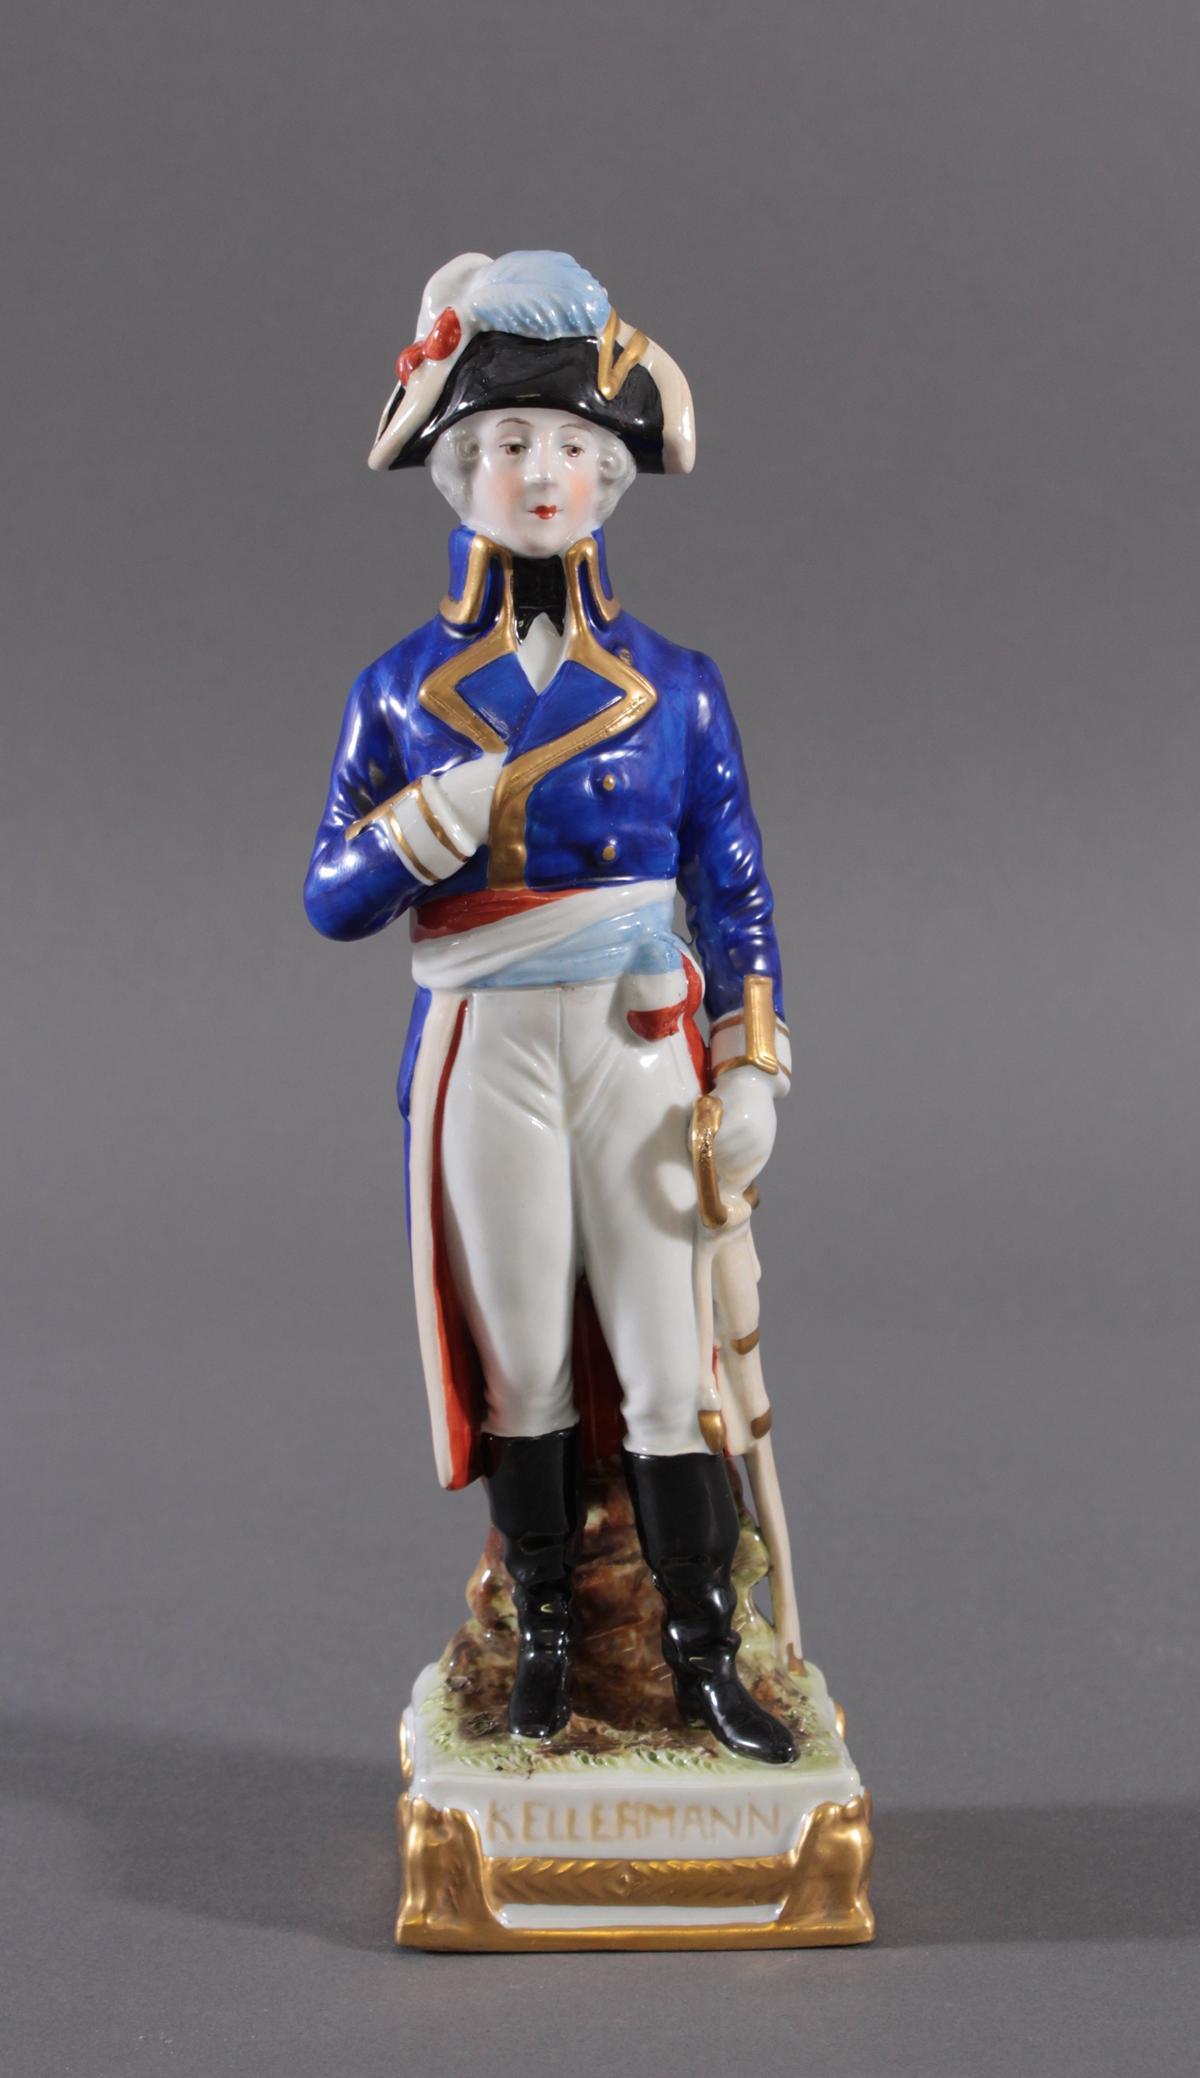 Scheibe Alsbach – Figur, Marshall Francois-Christophe Kellermann 1735 – 1820